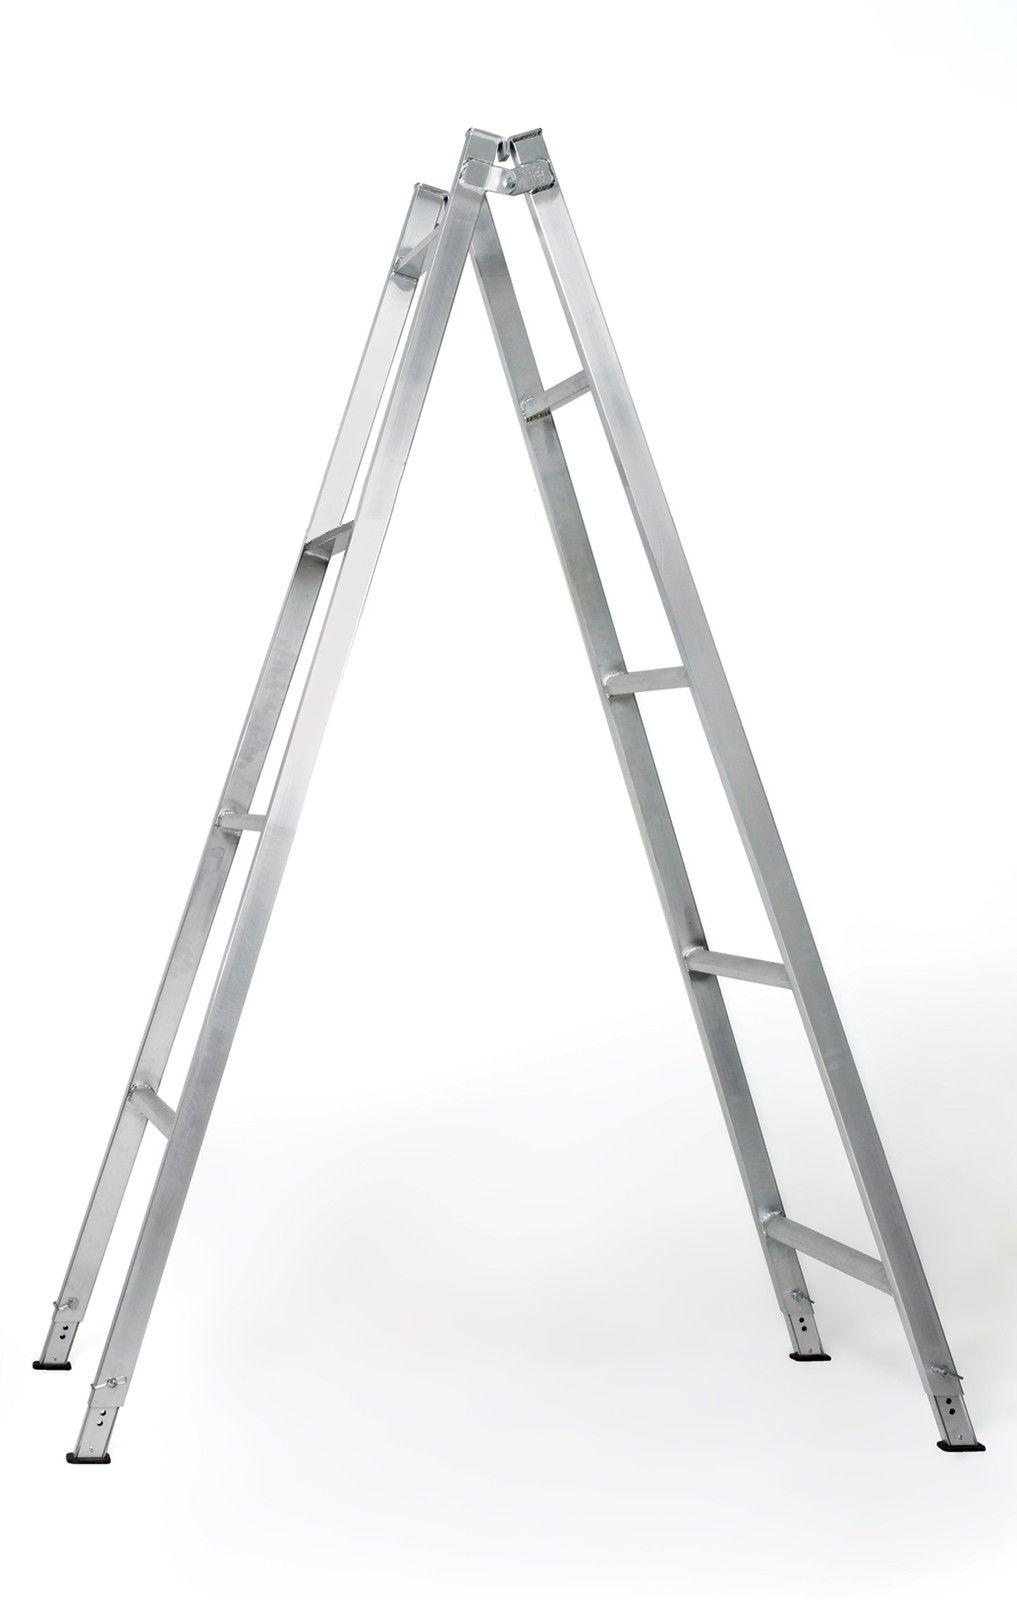 Adjustable Leg Trestles Ladder Central Australia